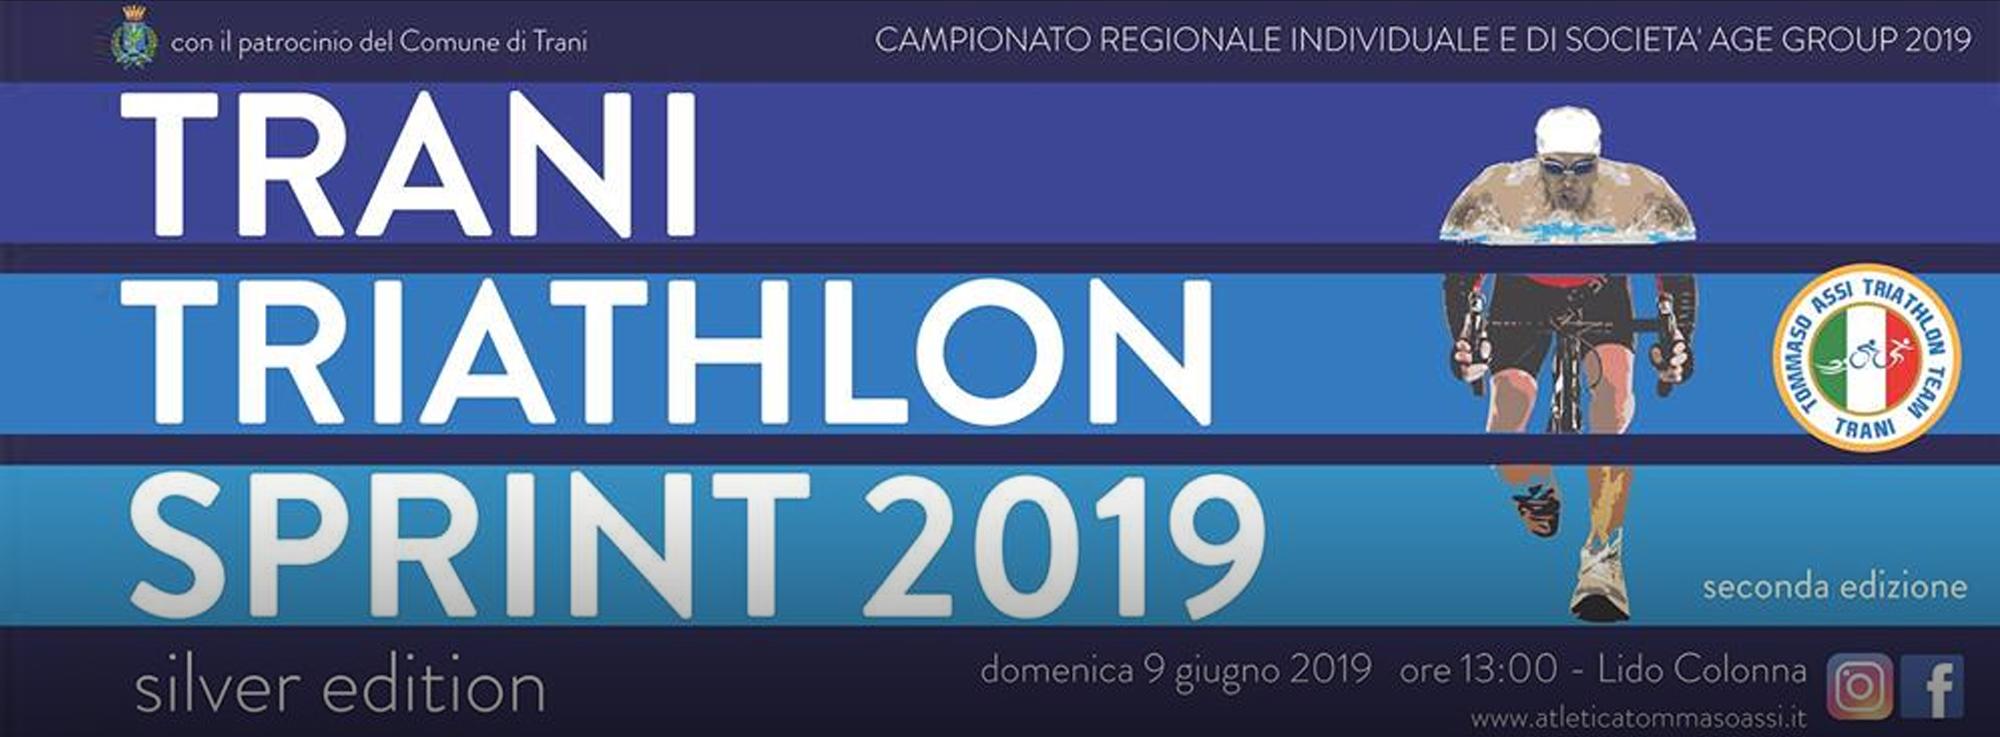 Trani: Triathlon Trani